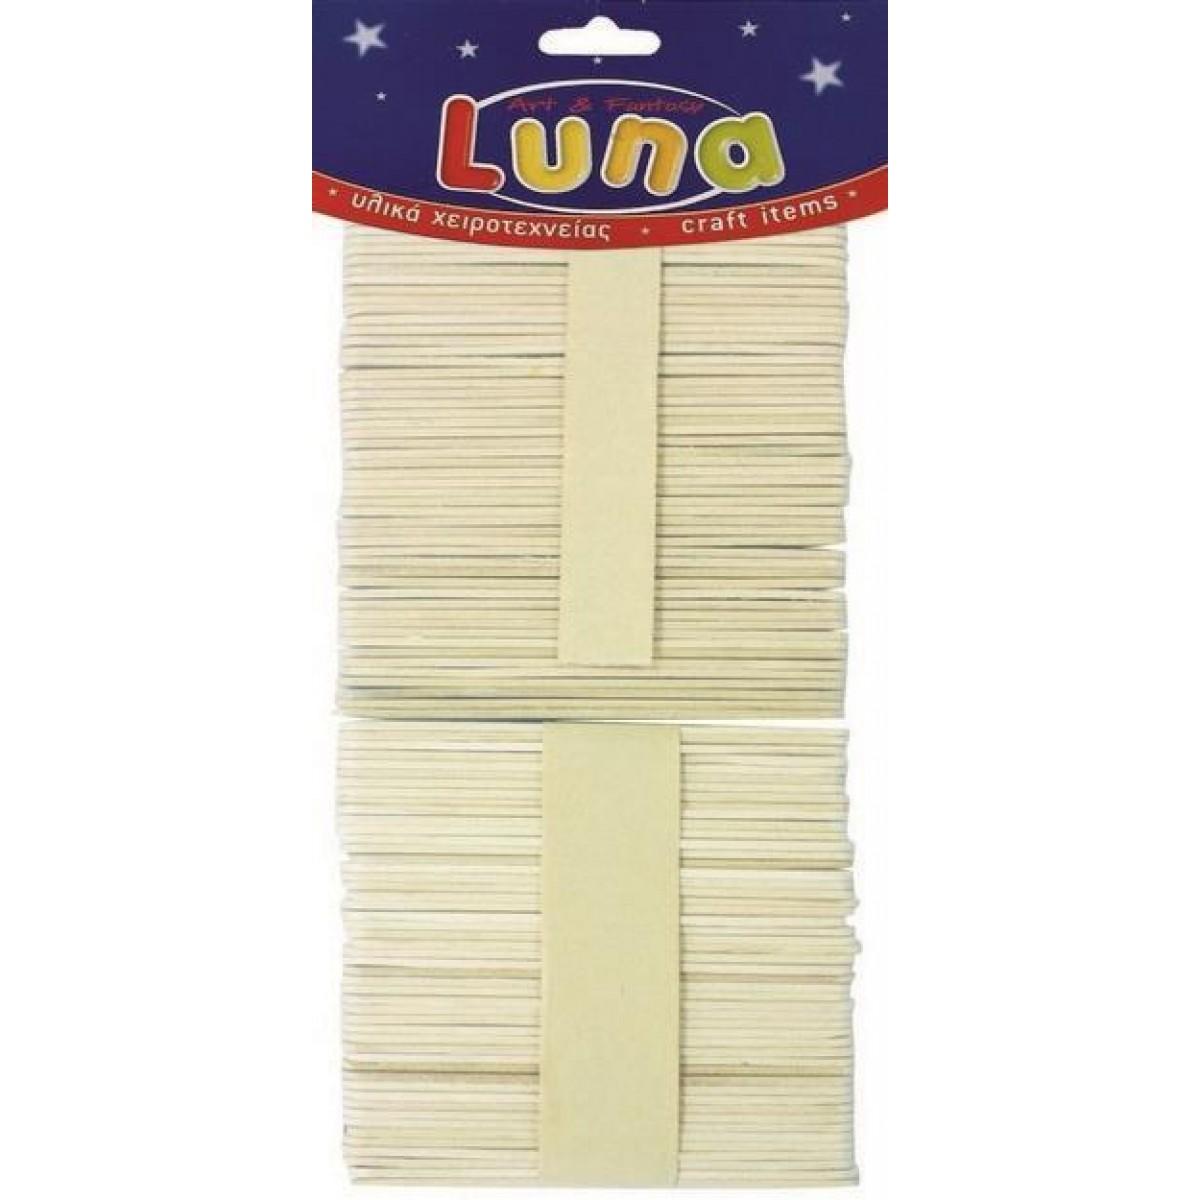 Luna Ξυλάκια Χειροτεχνίας Λεπτά (100 Τεμ.) Υλικά Χειροτεχνίας